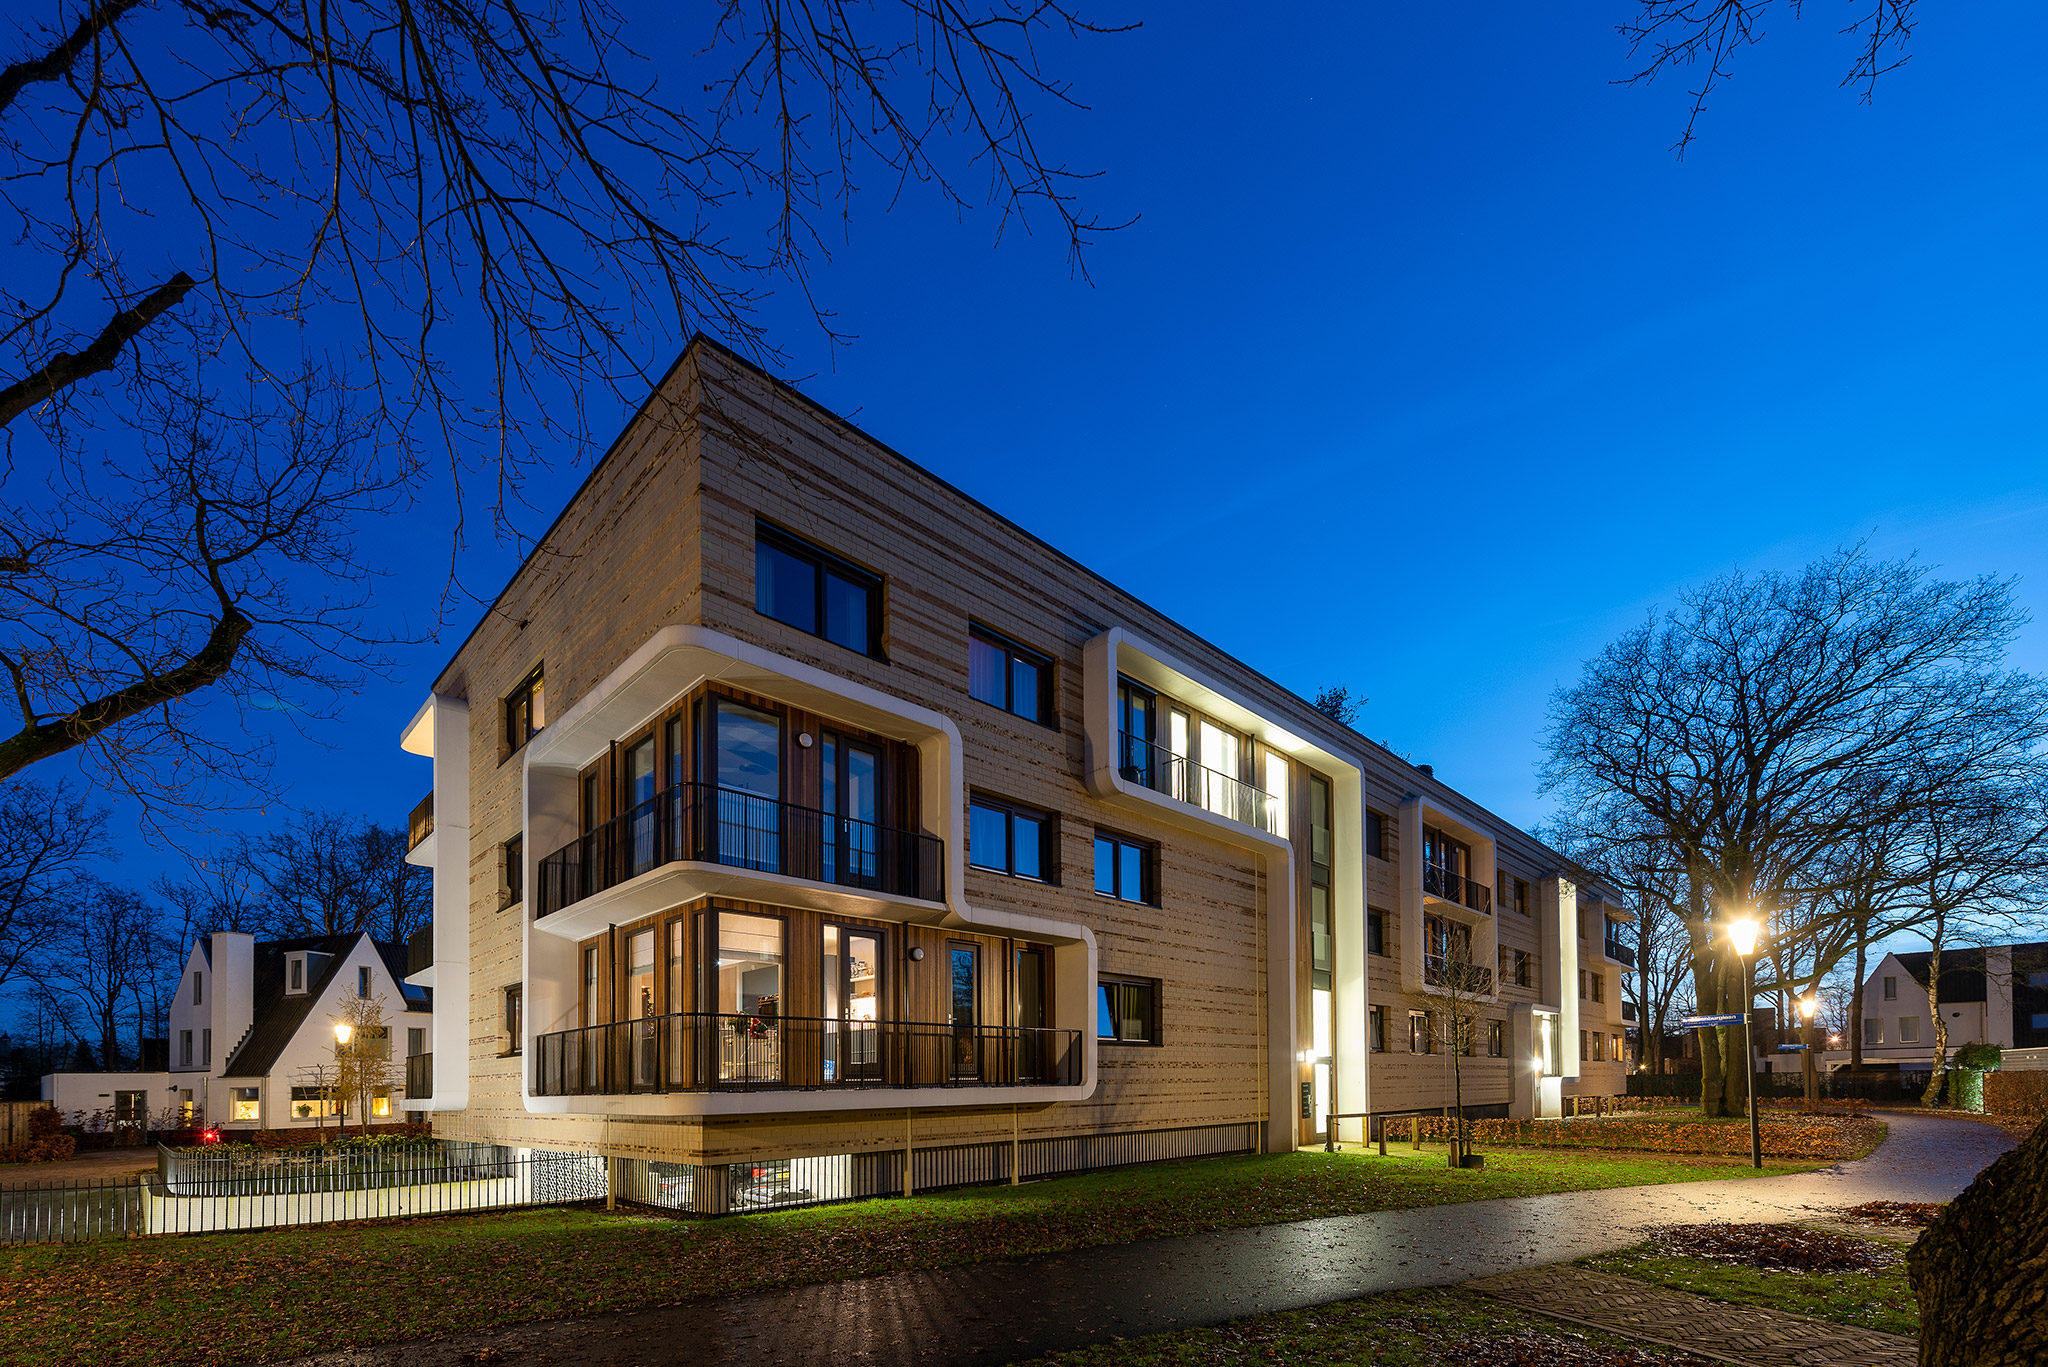 Simone Drost Architecture Planet Pab Architecture Appartementen Stdhouderspark Vught voorgevel overzicht entreegevel en entree parkeergarage bij schemer